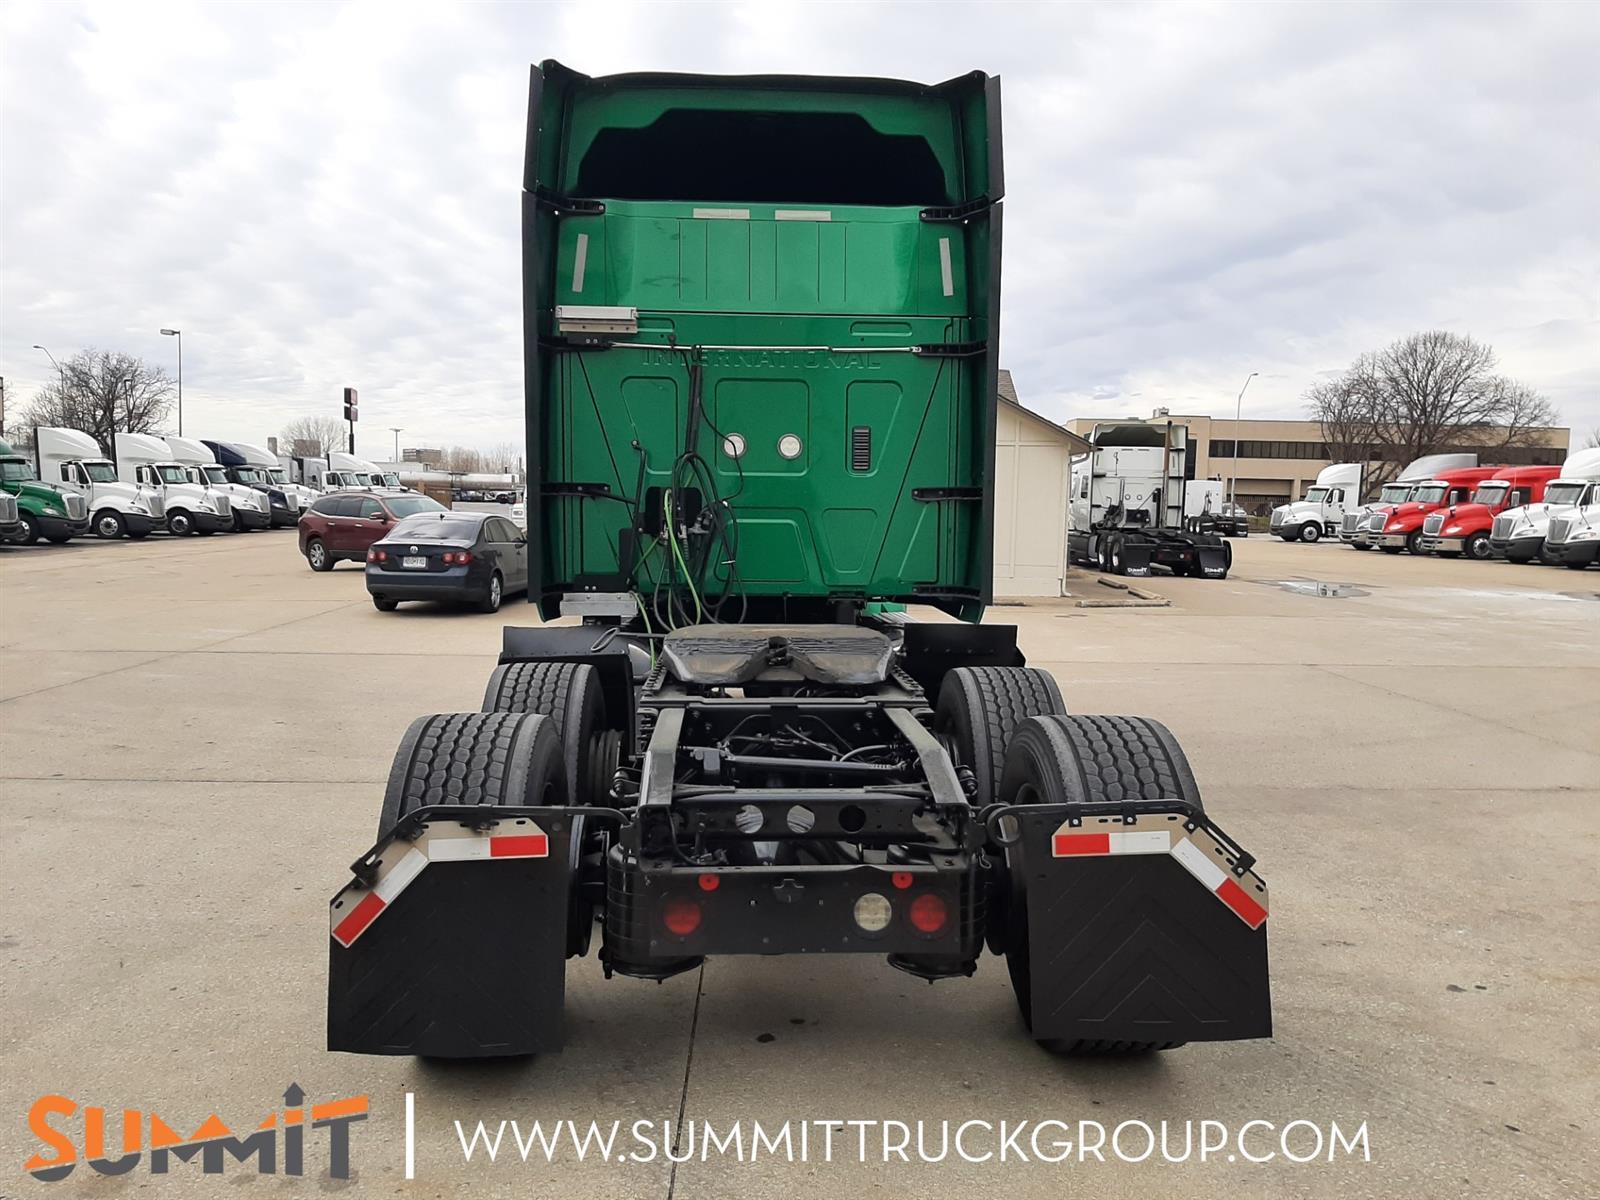 2017 International ProStar+ Sleeper Cab 6x4, Tractor #135N202154 - photo 1